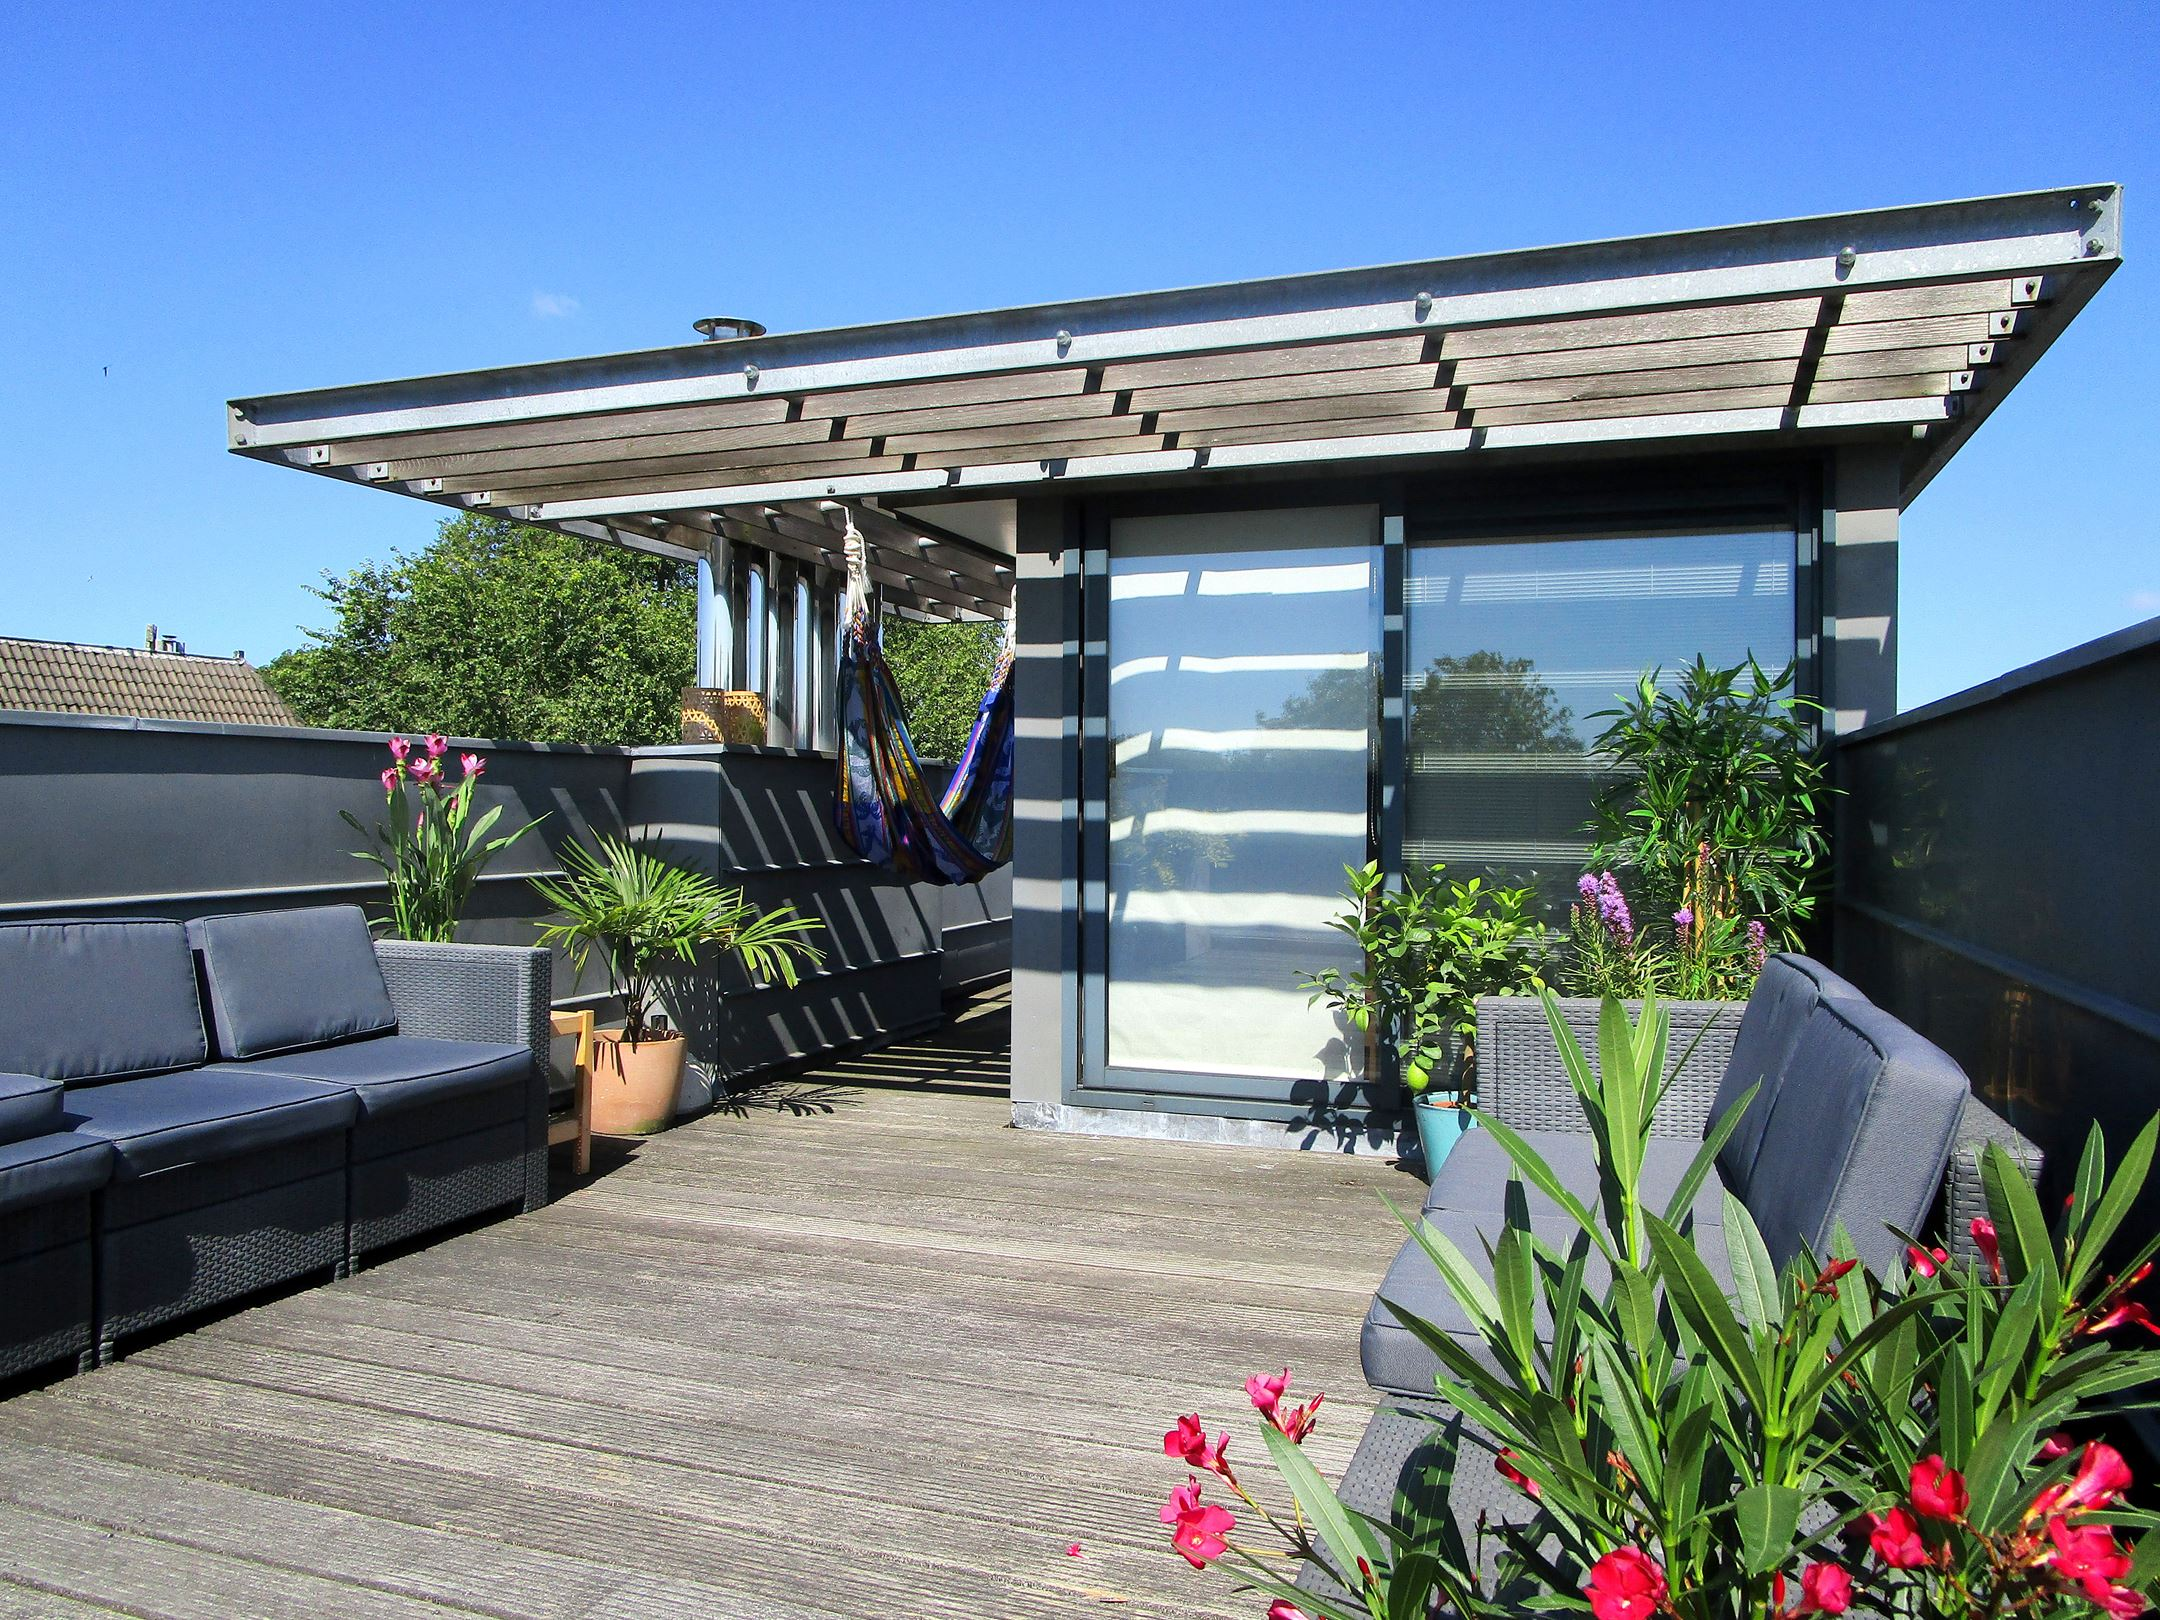 Verkocht: nieuwe herengracht 115 1011 sb amsterdam [funda]